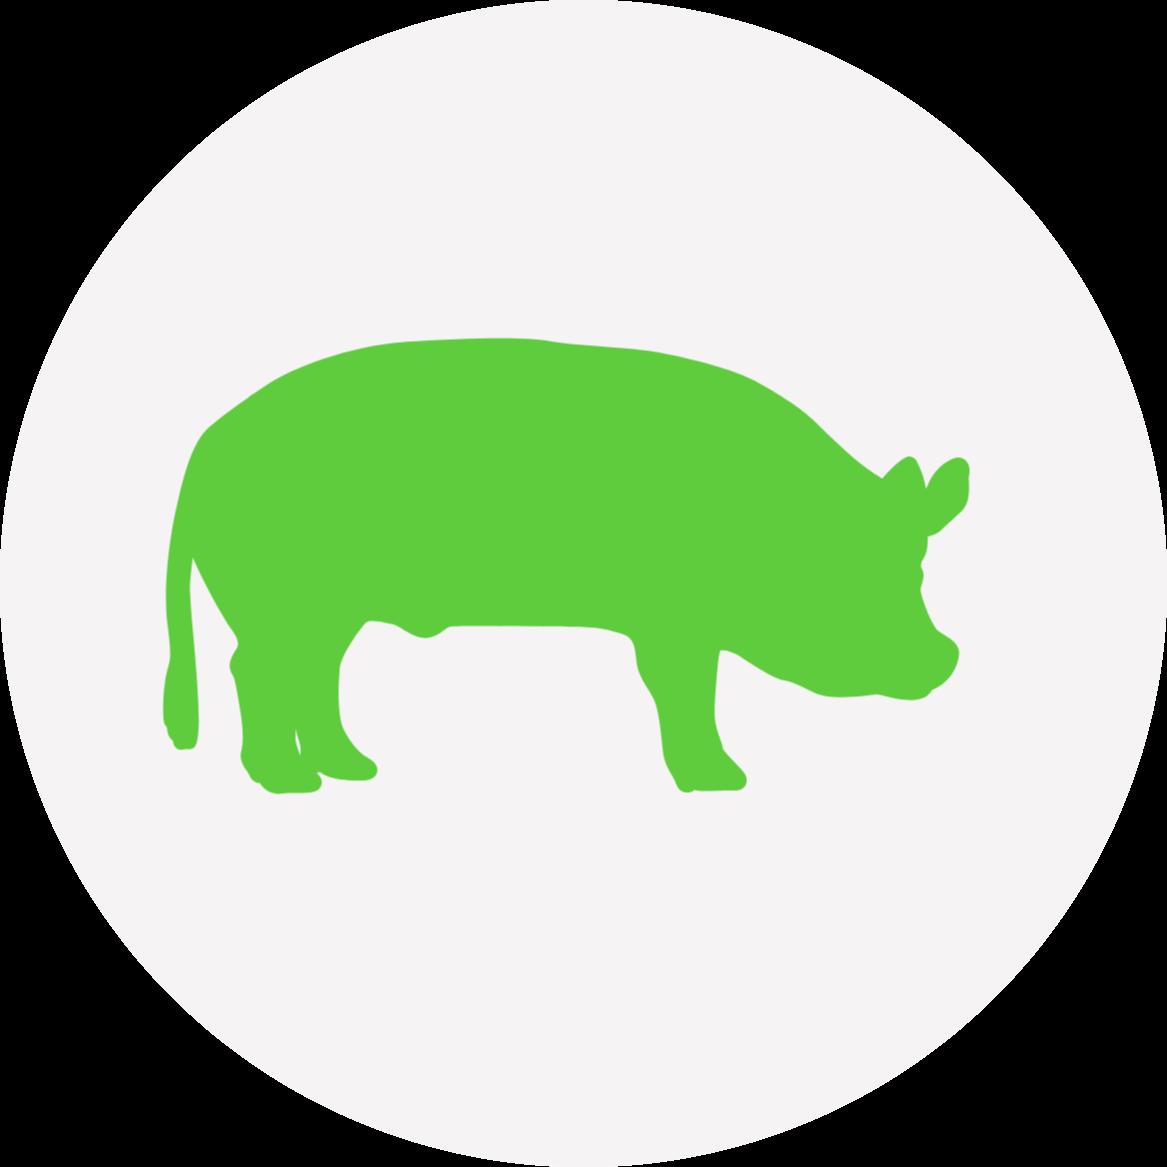 Hog roast catering icon